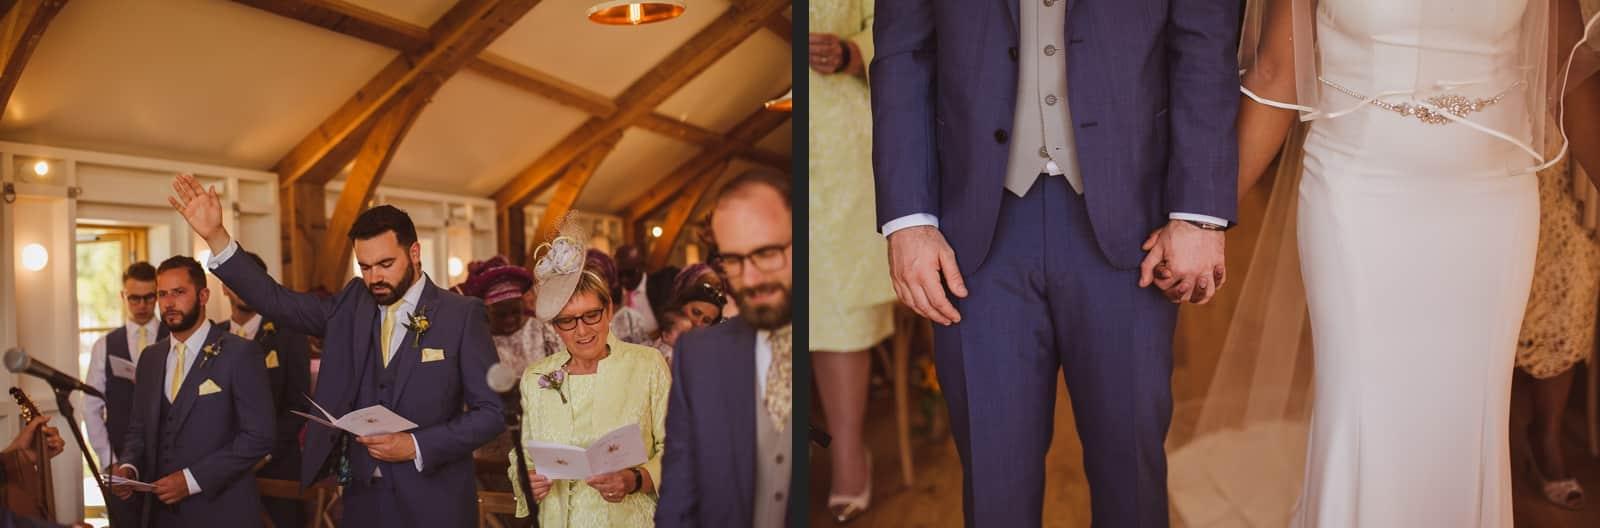 Cotswolds Wedding Photographer 0069